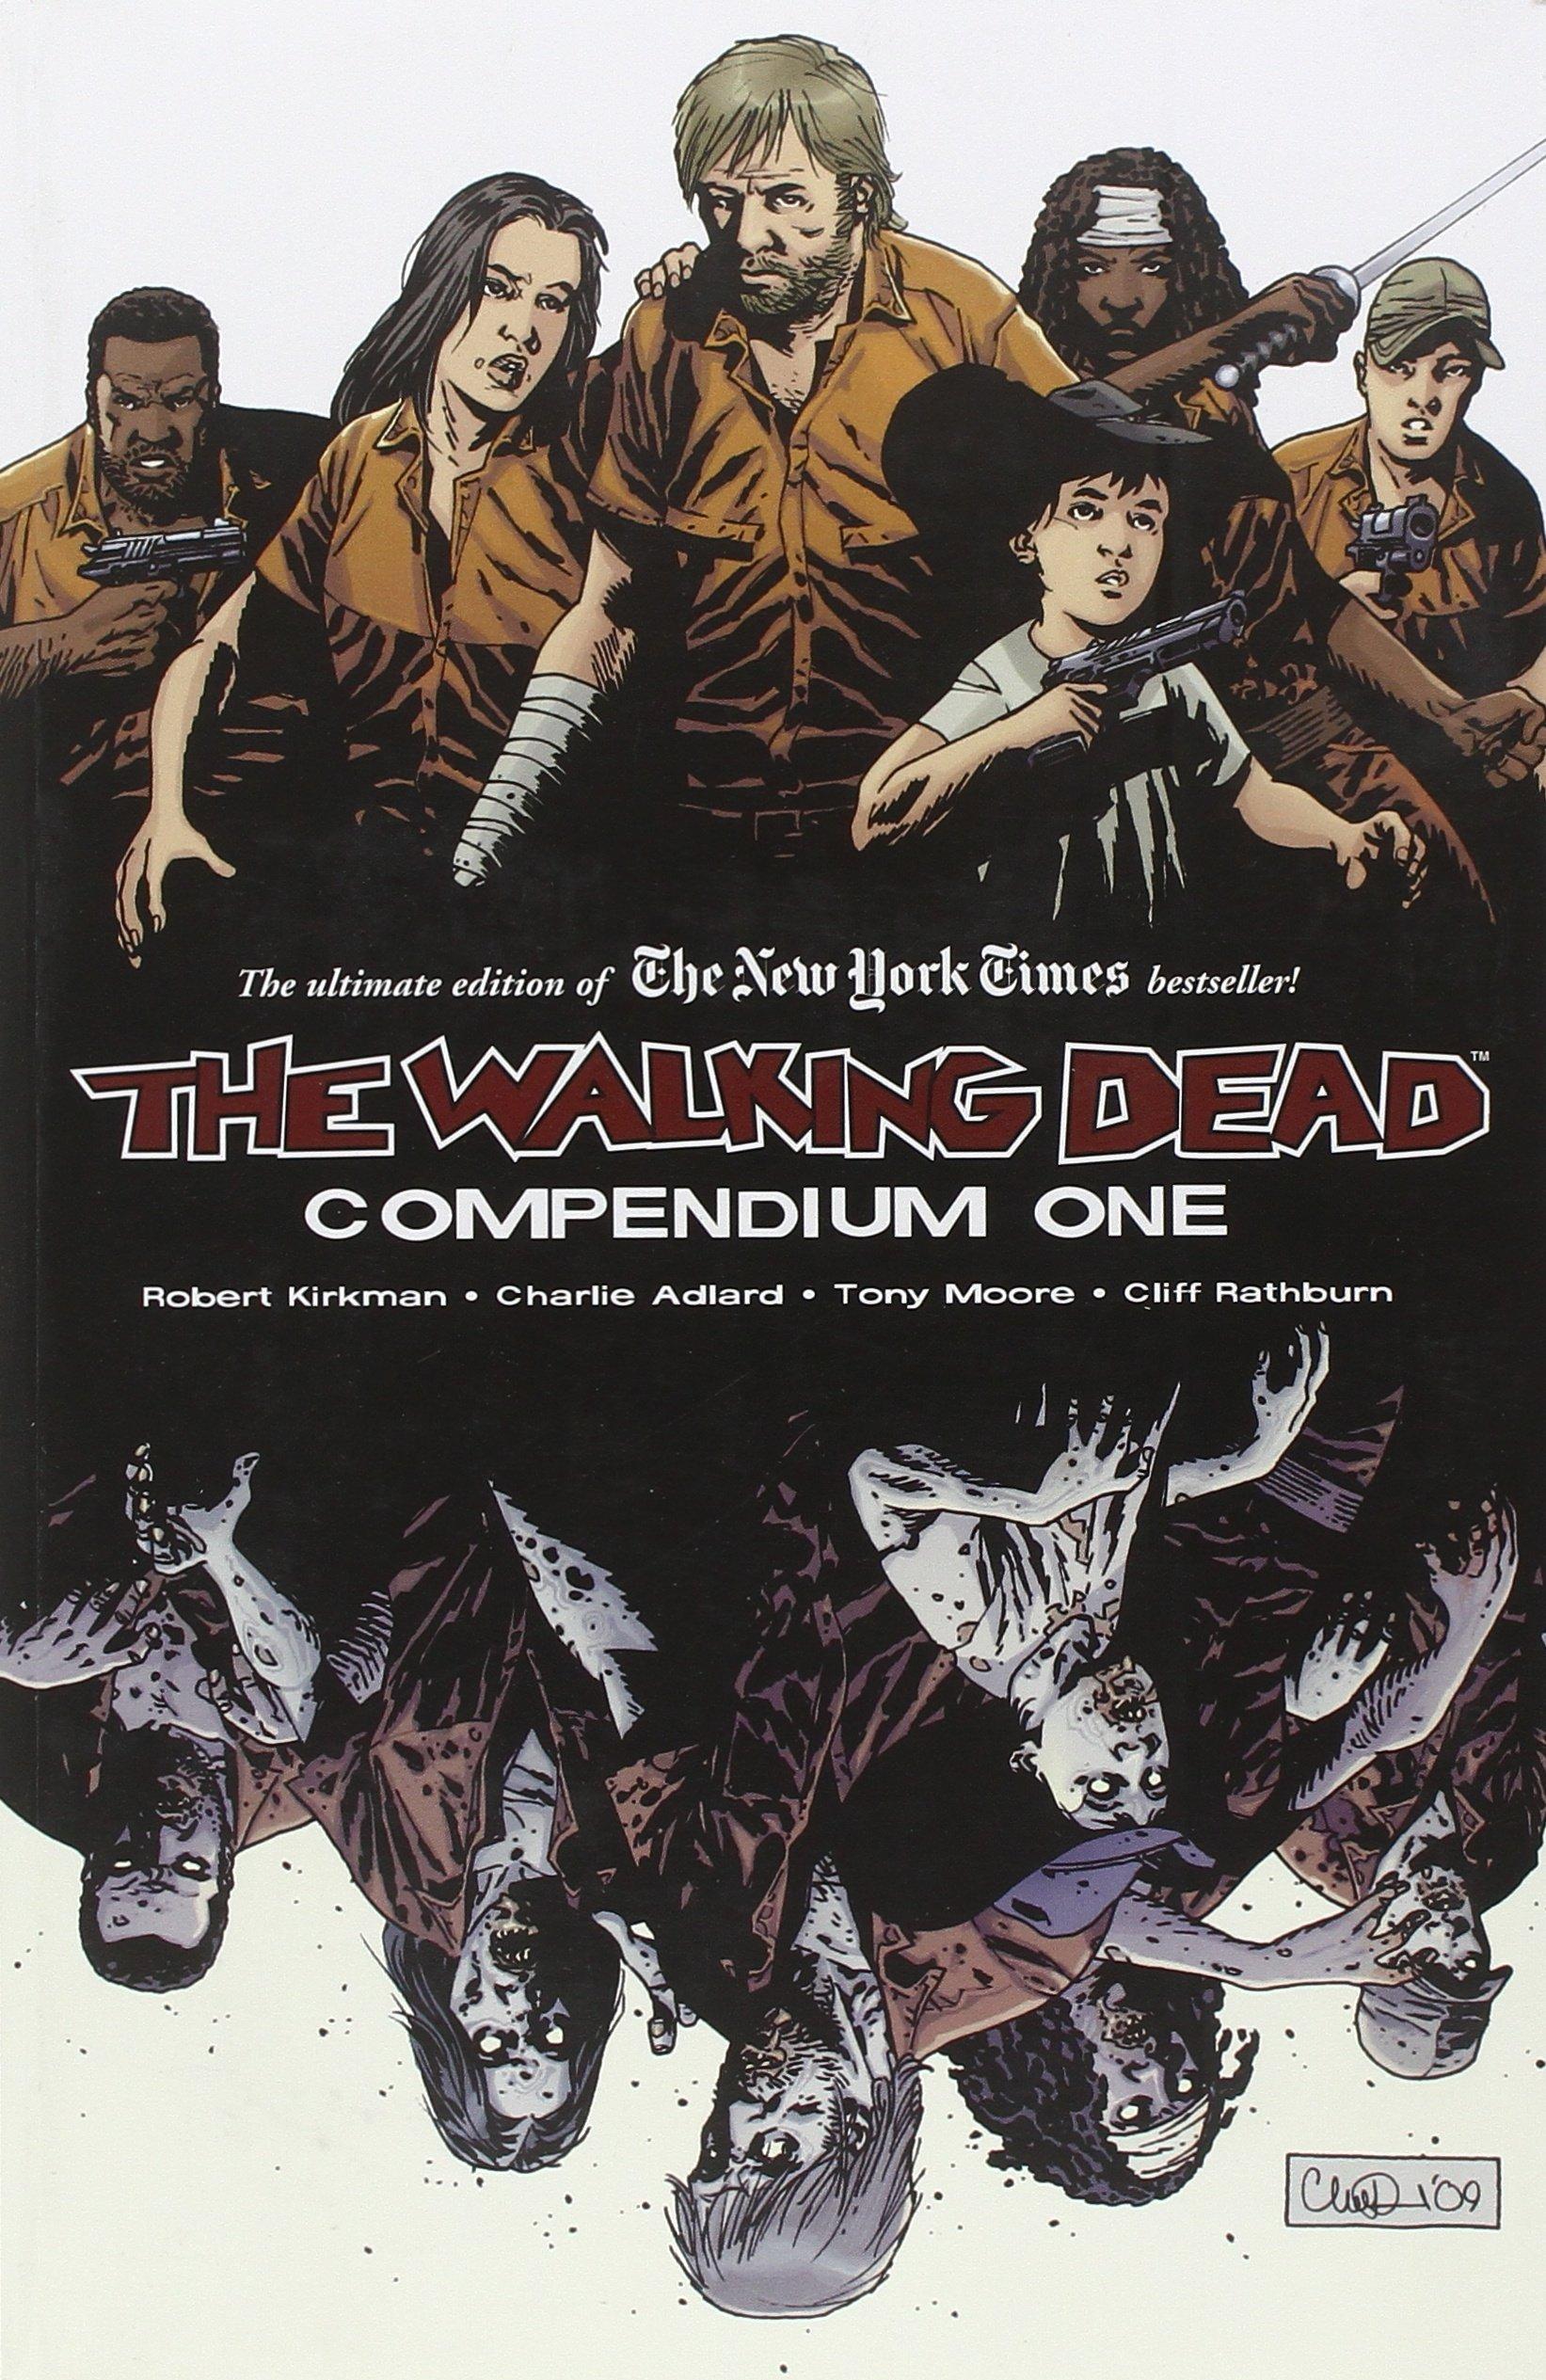 The Walking Dead Compendium Volume 1 01 Amazon Co Uk Kirkman Robert Adlard Charlie Rathburn Cliff 8580001039817 Books